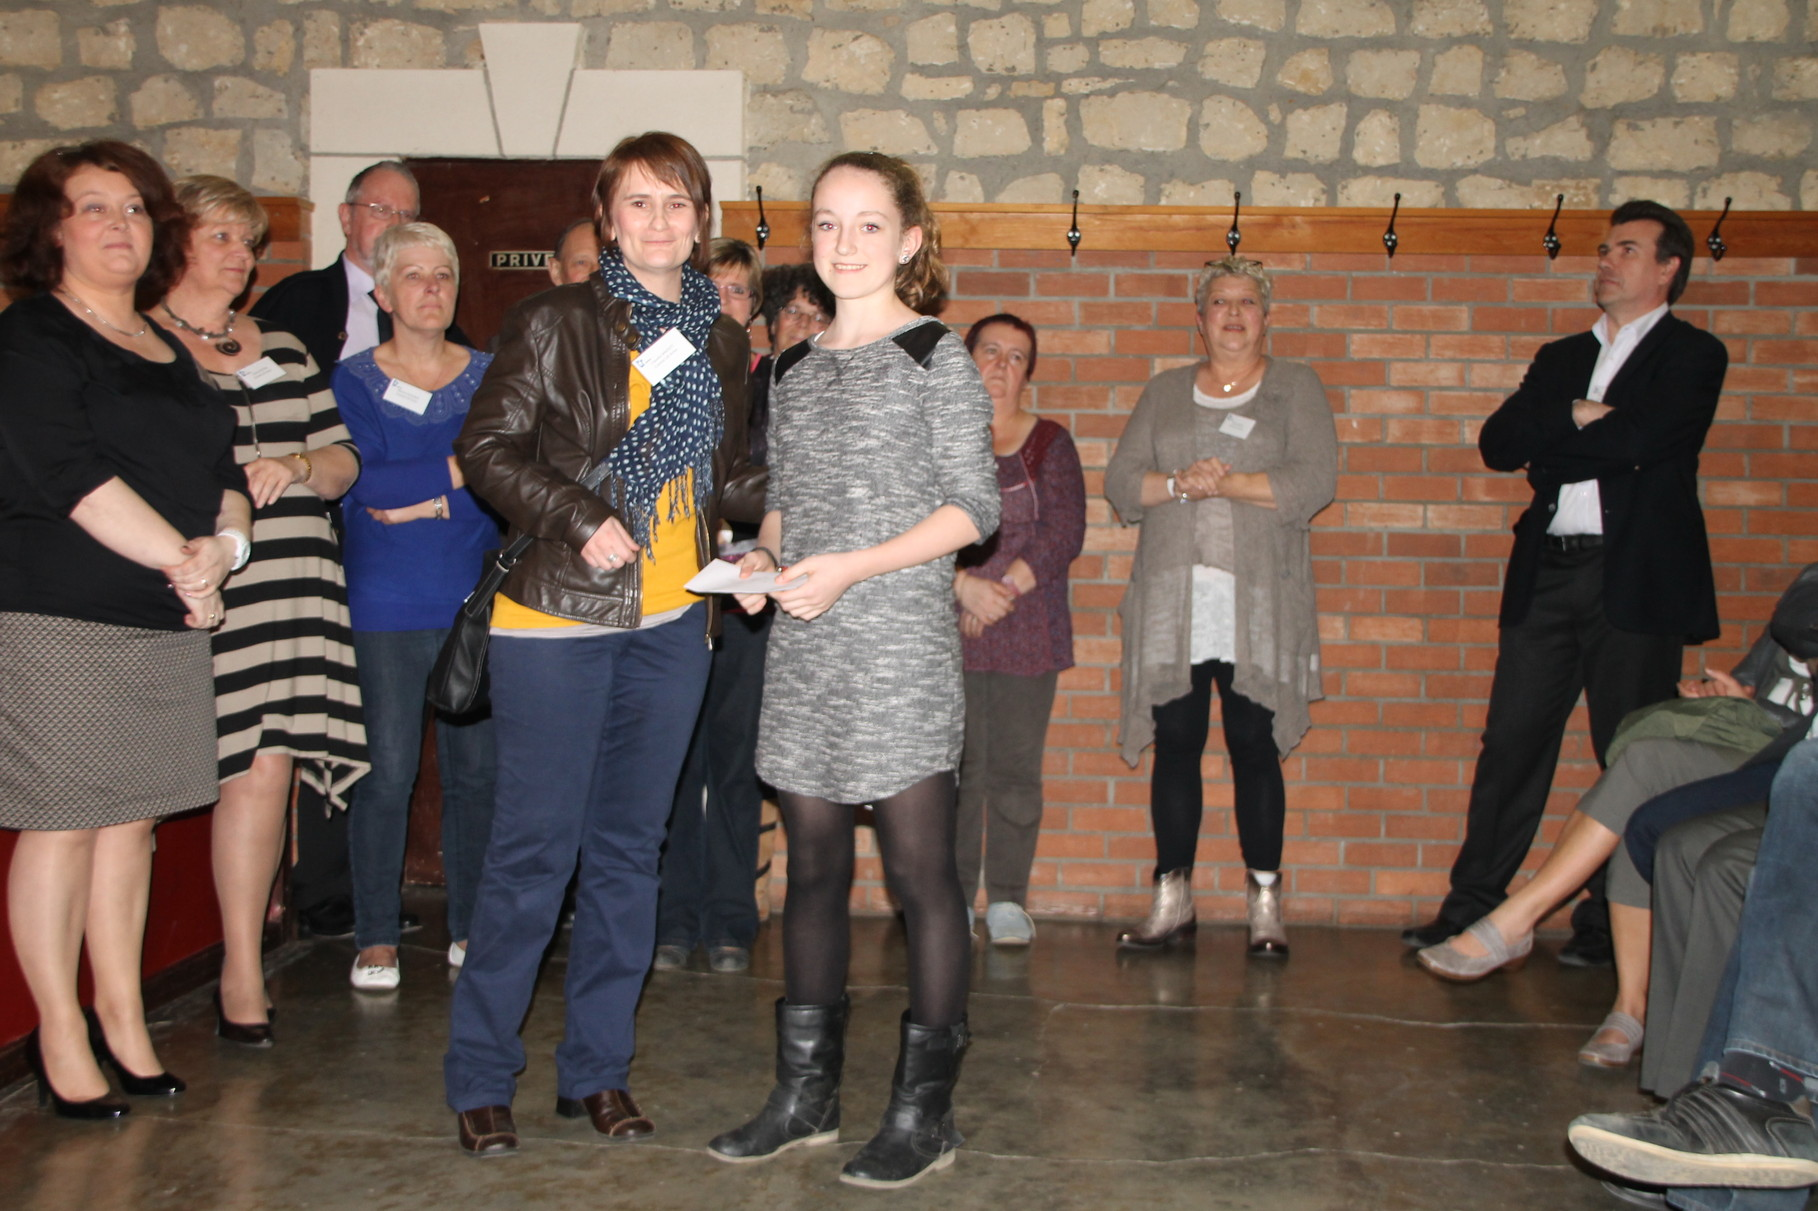 10ème prix remis pas Claudia Massot - Membre de la LIR Arlon